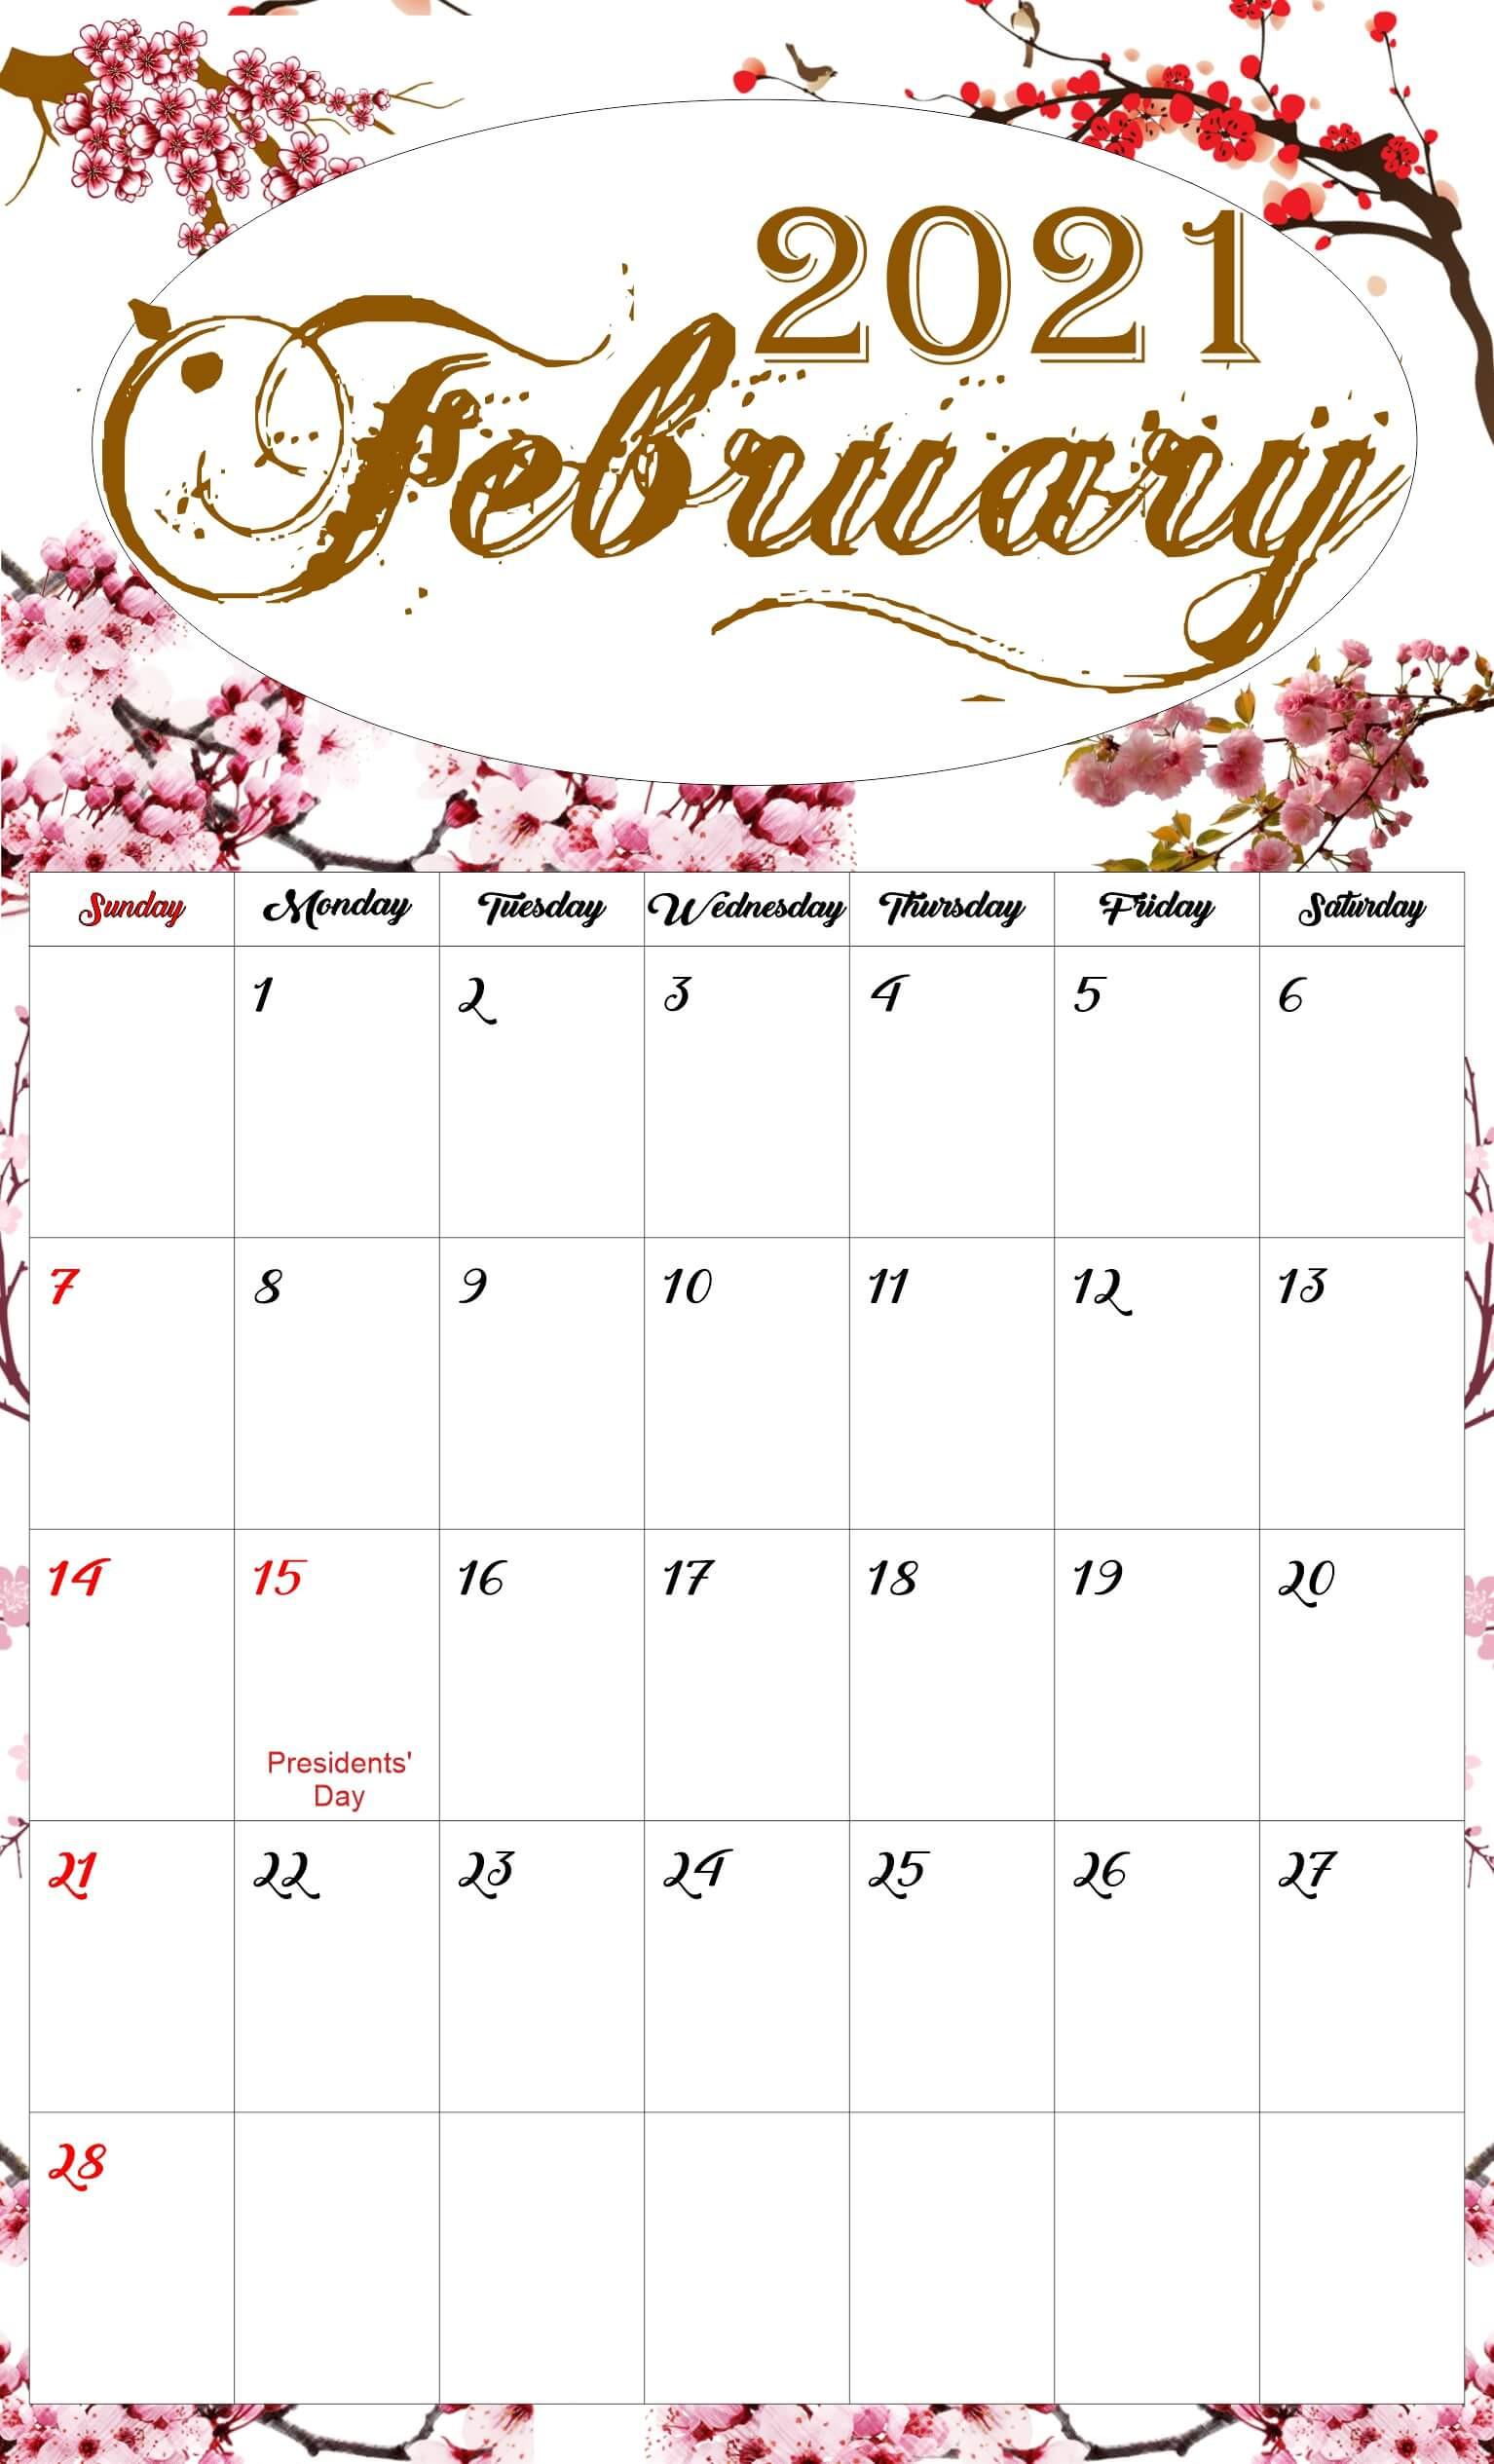 Floral February 2021 Calendar Printable - Free Printable  February 2021 Calendar Printable